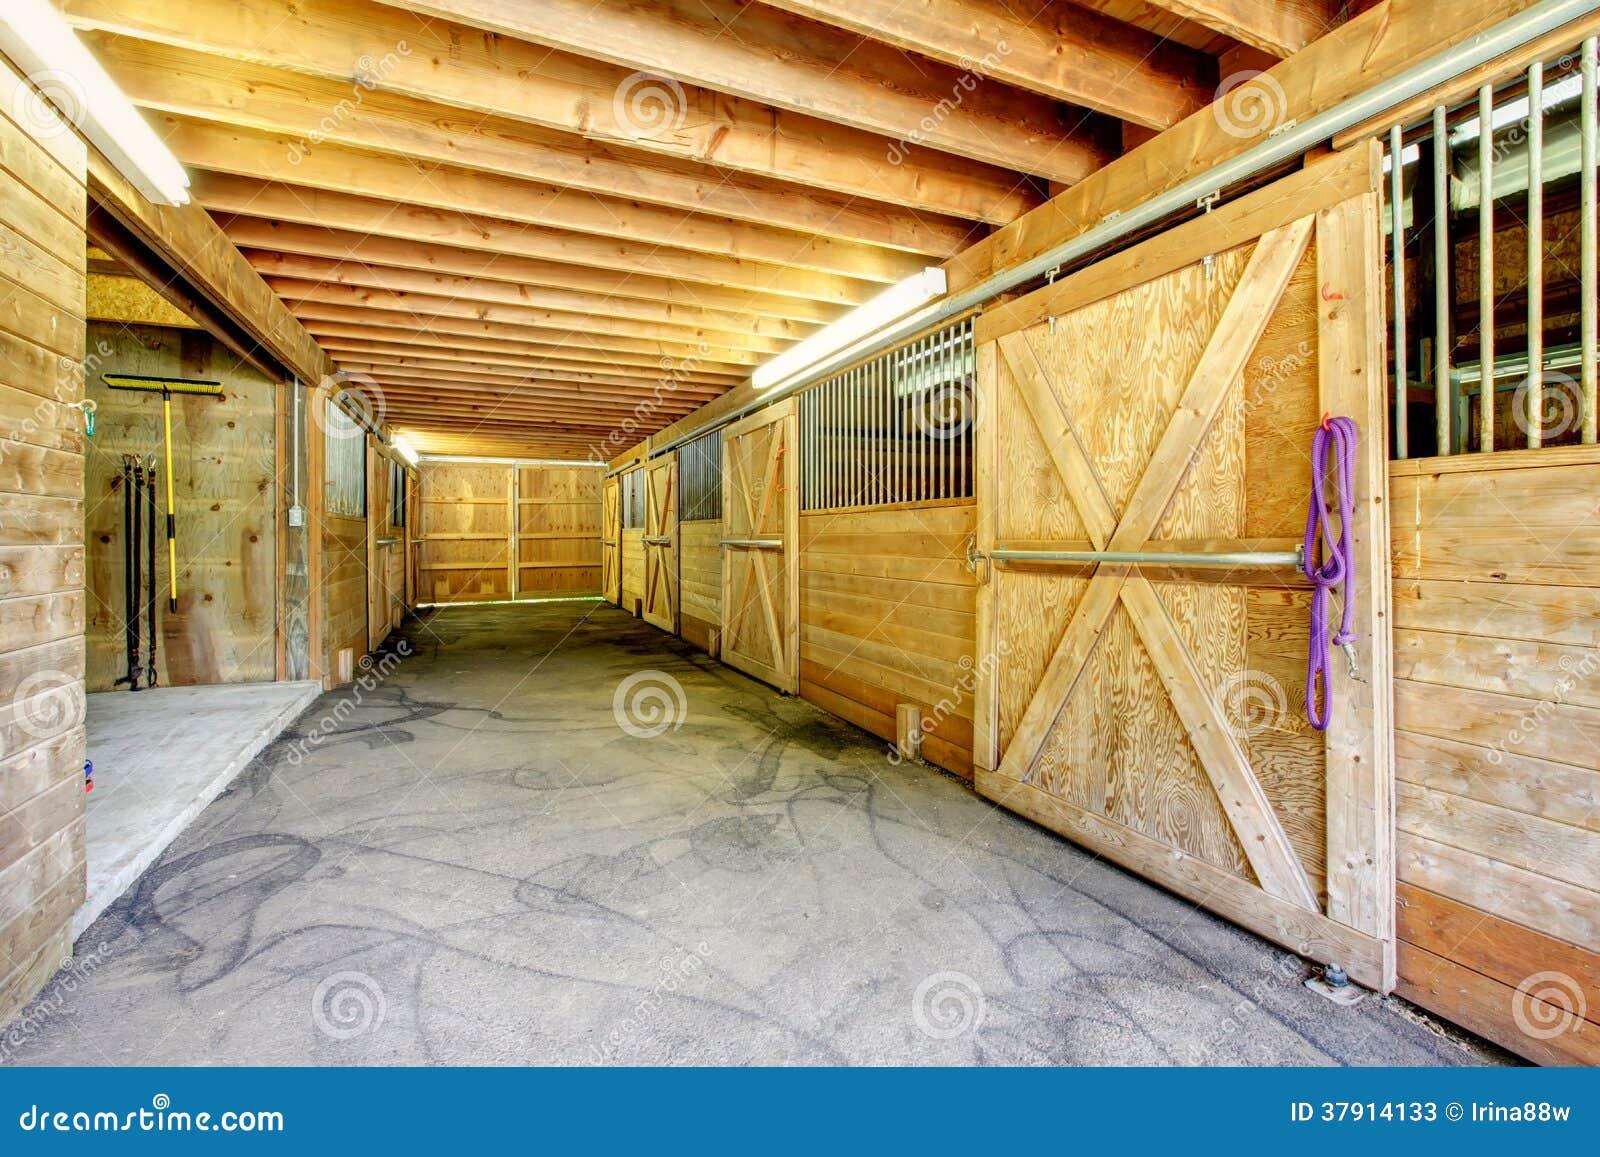 Large Farm Horse Stable Barn. Stock Image - Image: 37914133